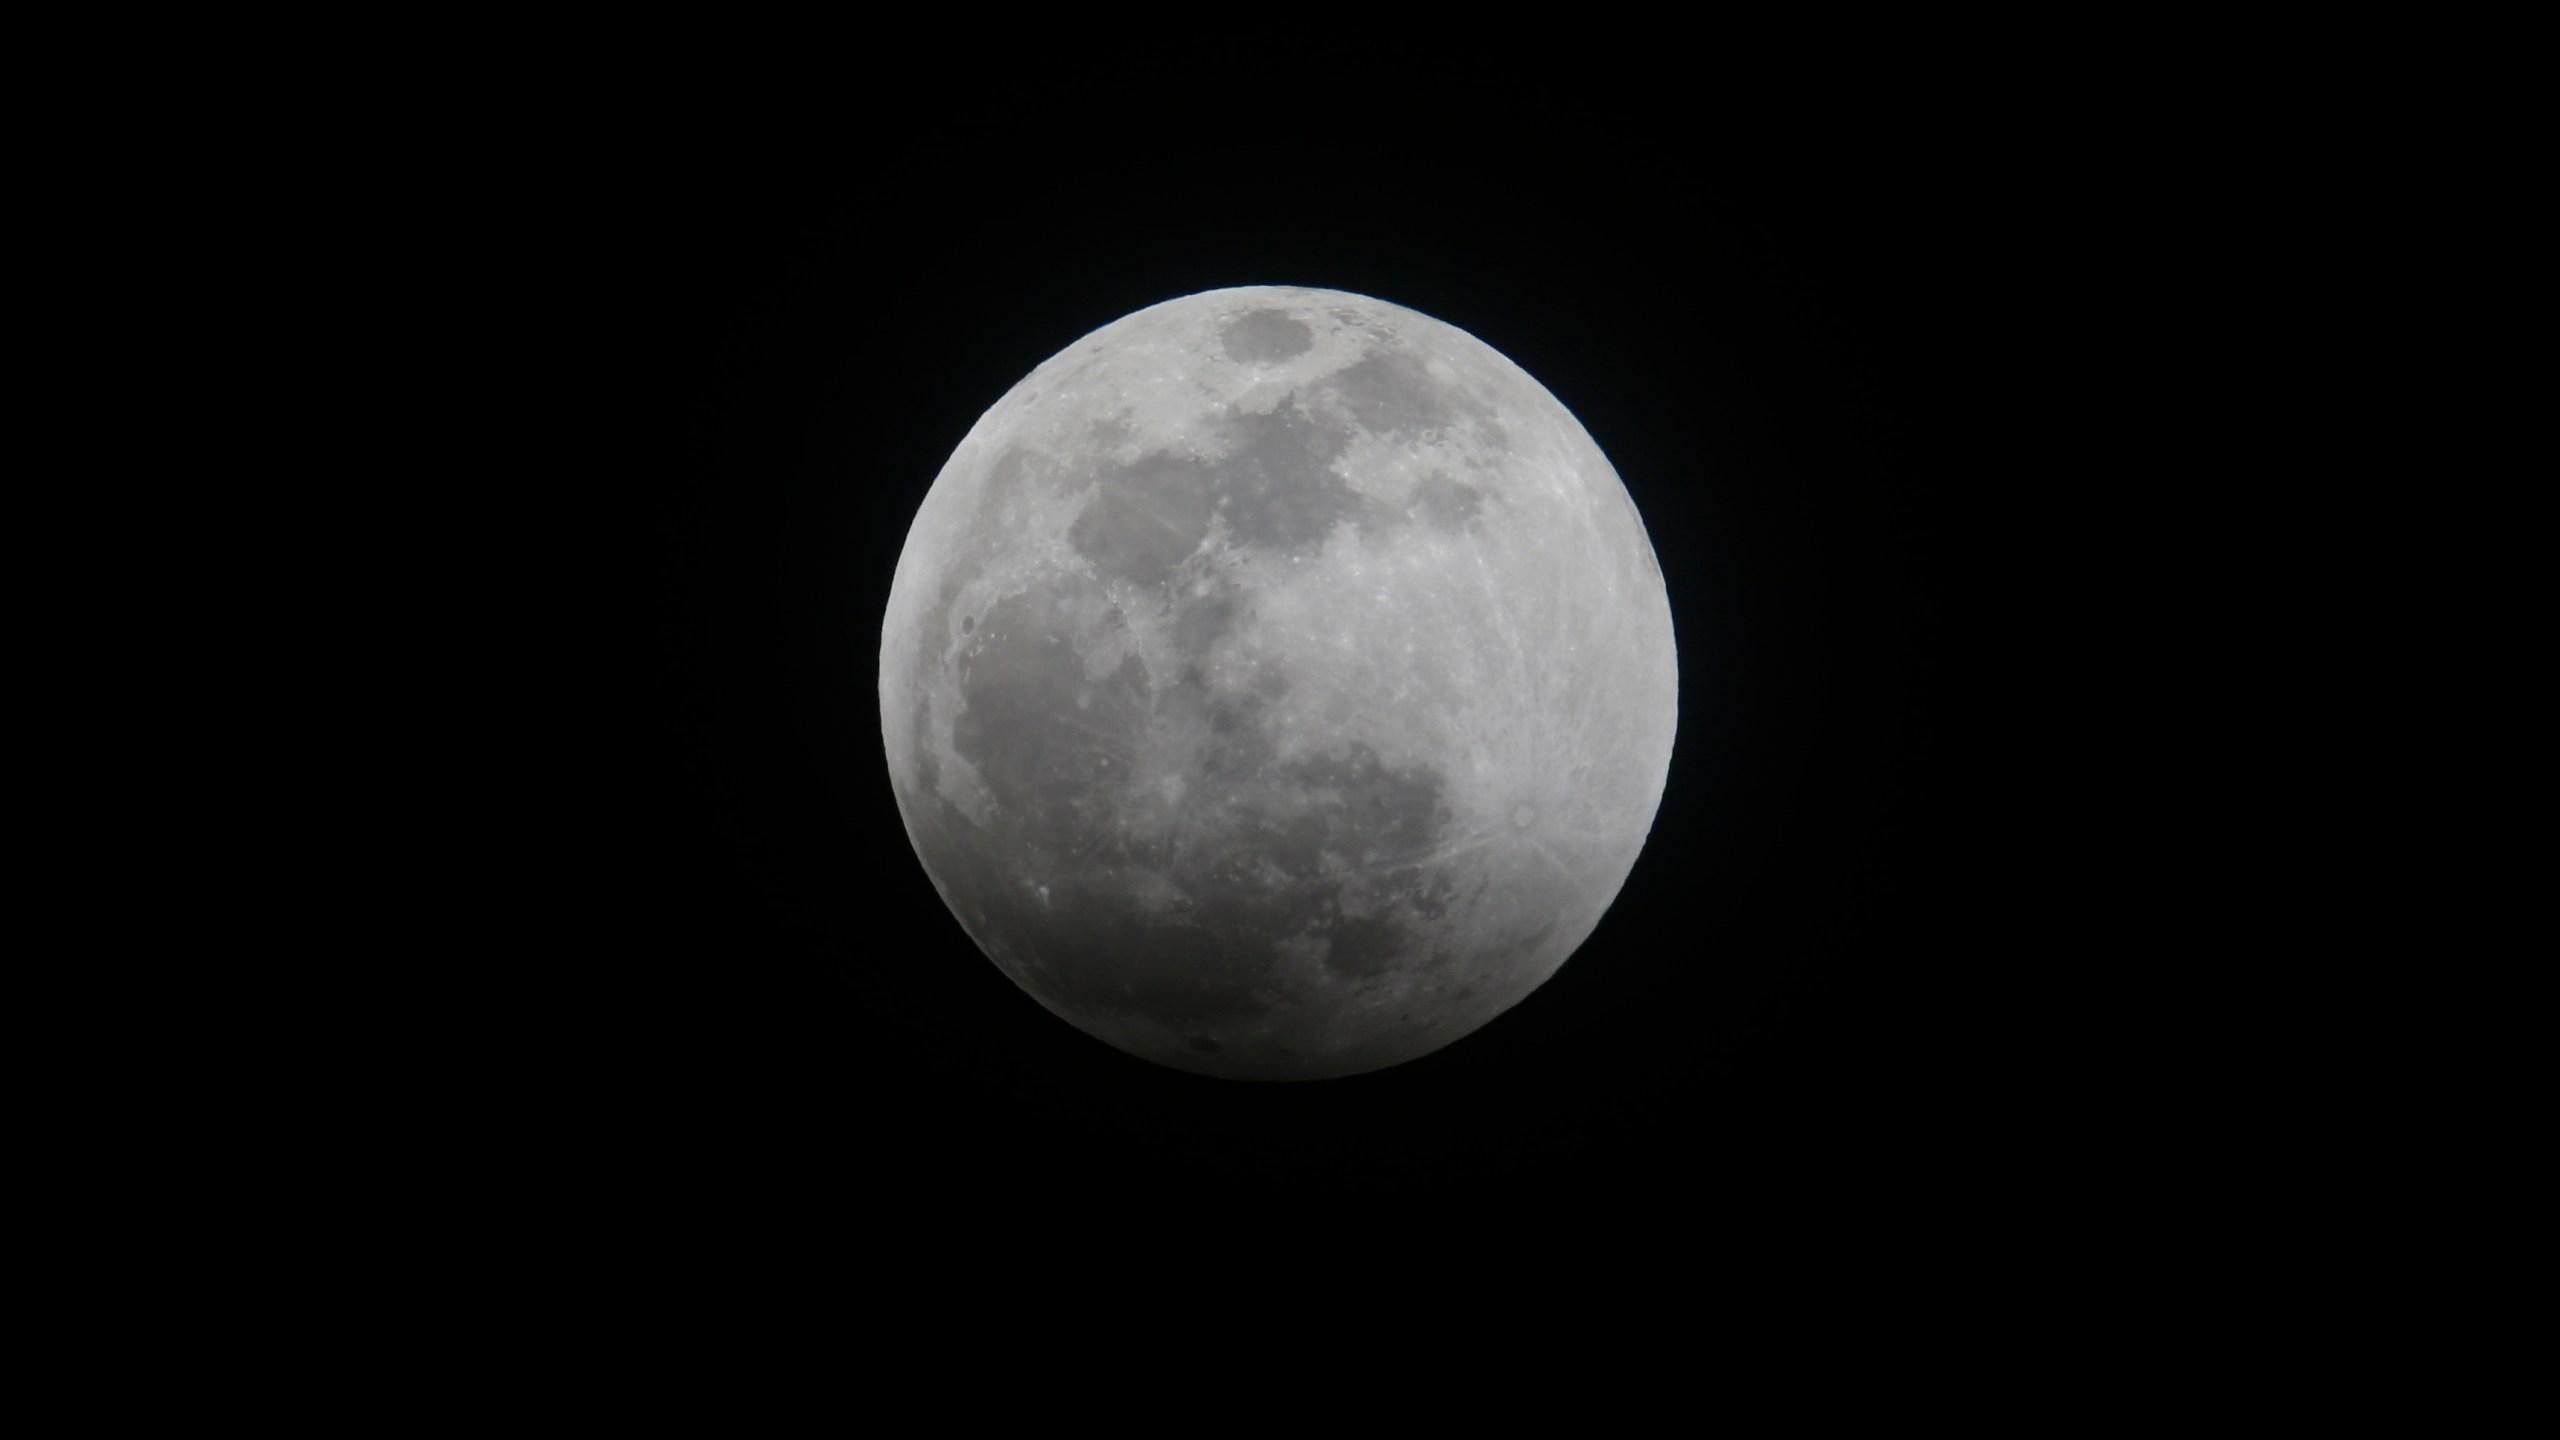 Lunar_Eclipse_Supermoon_09549-159532.jpg58331628